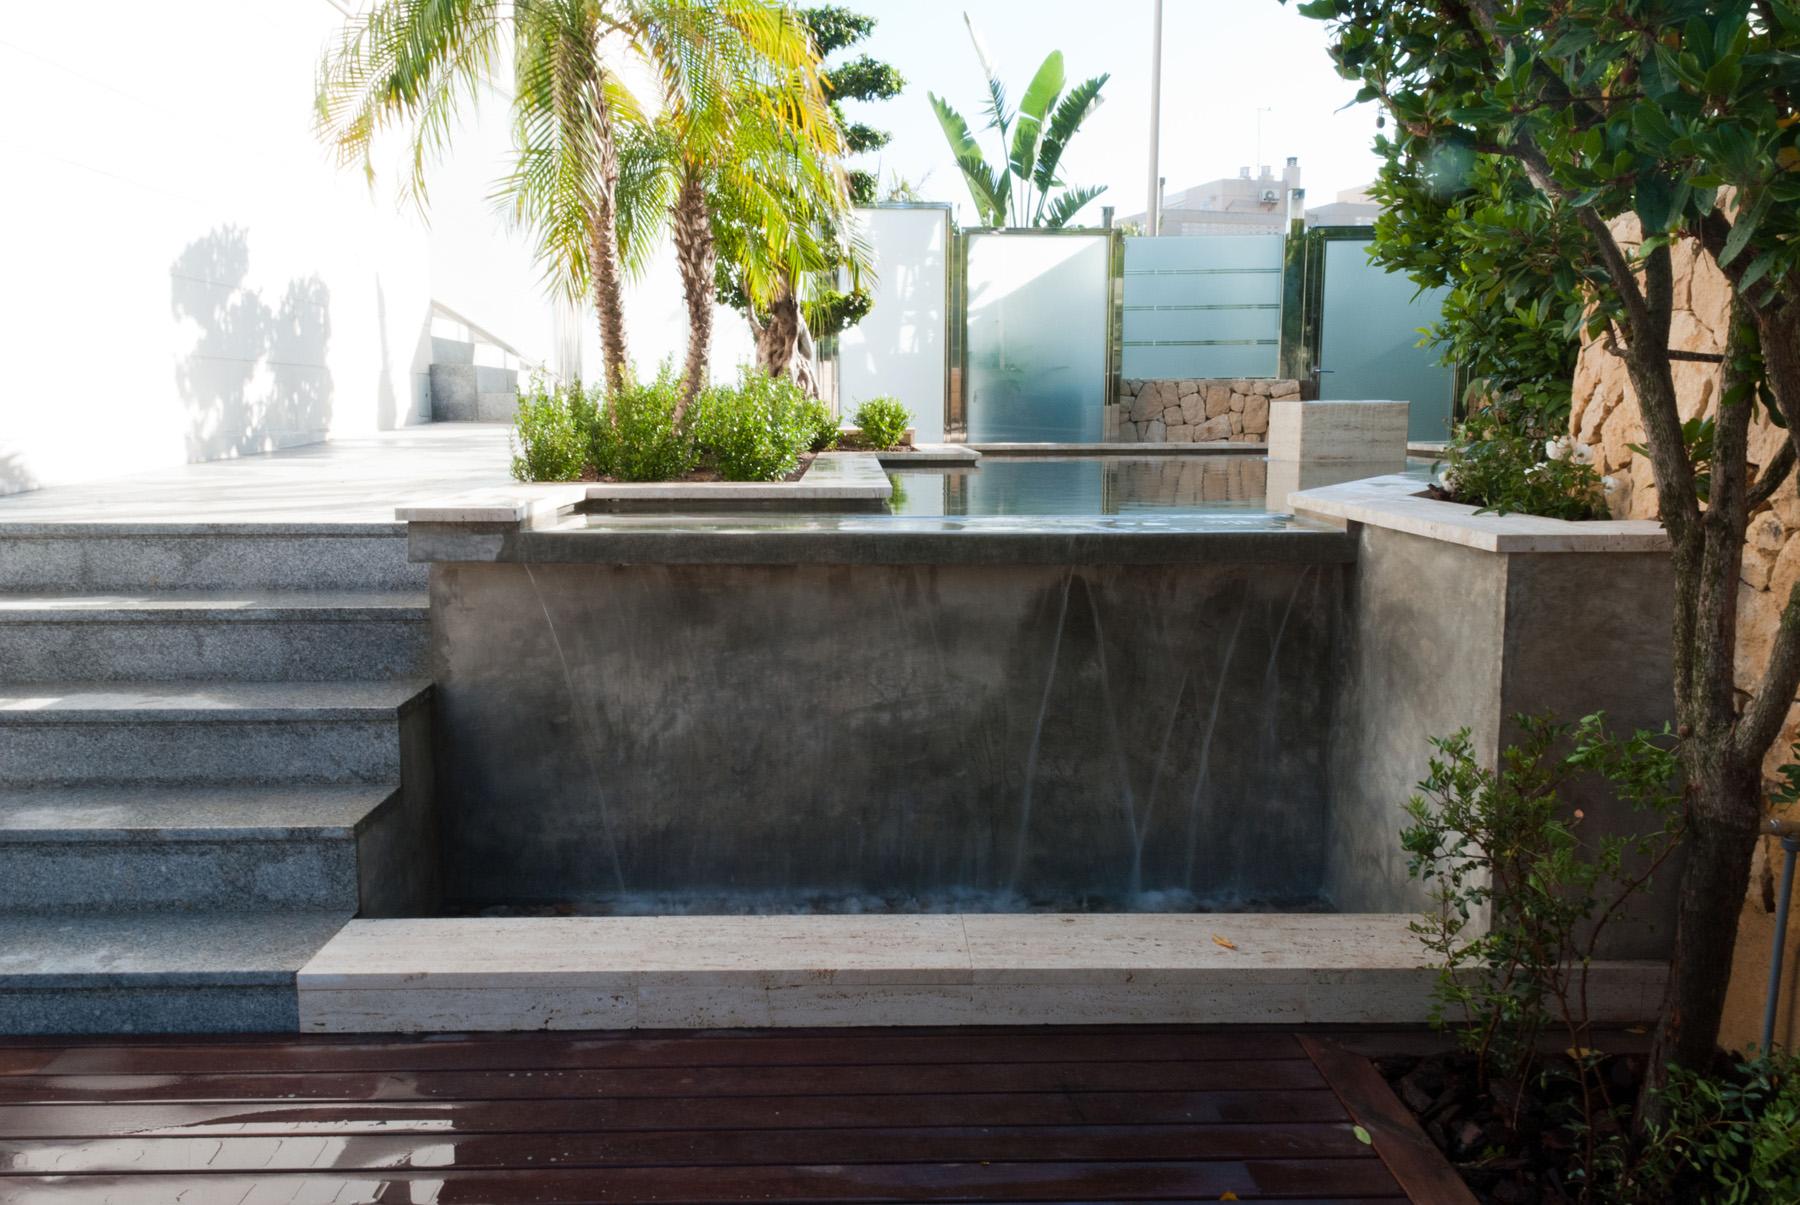 Diseno de jardin con fuente david jim nez arquitectura - Diseno jardines madrid ...